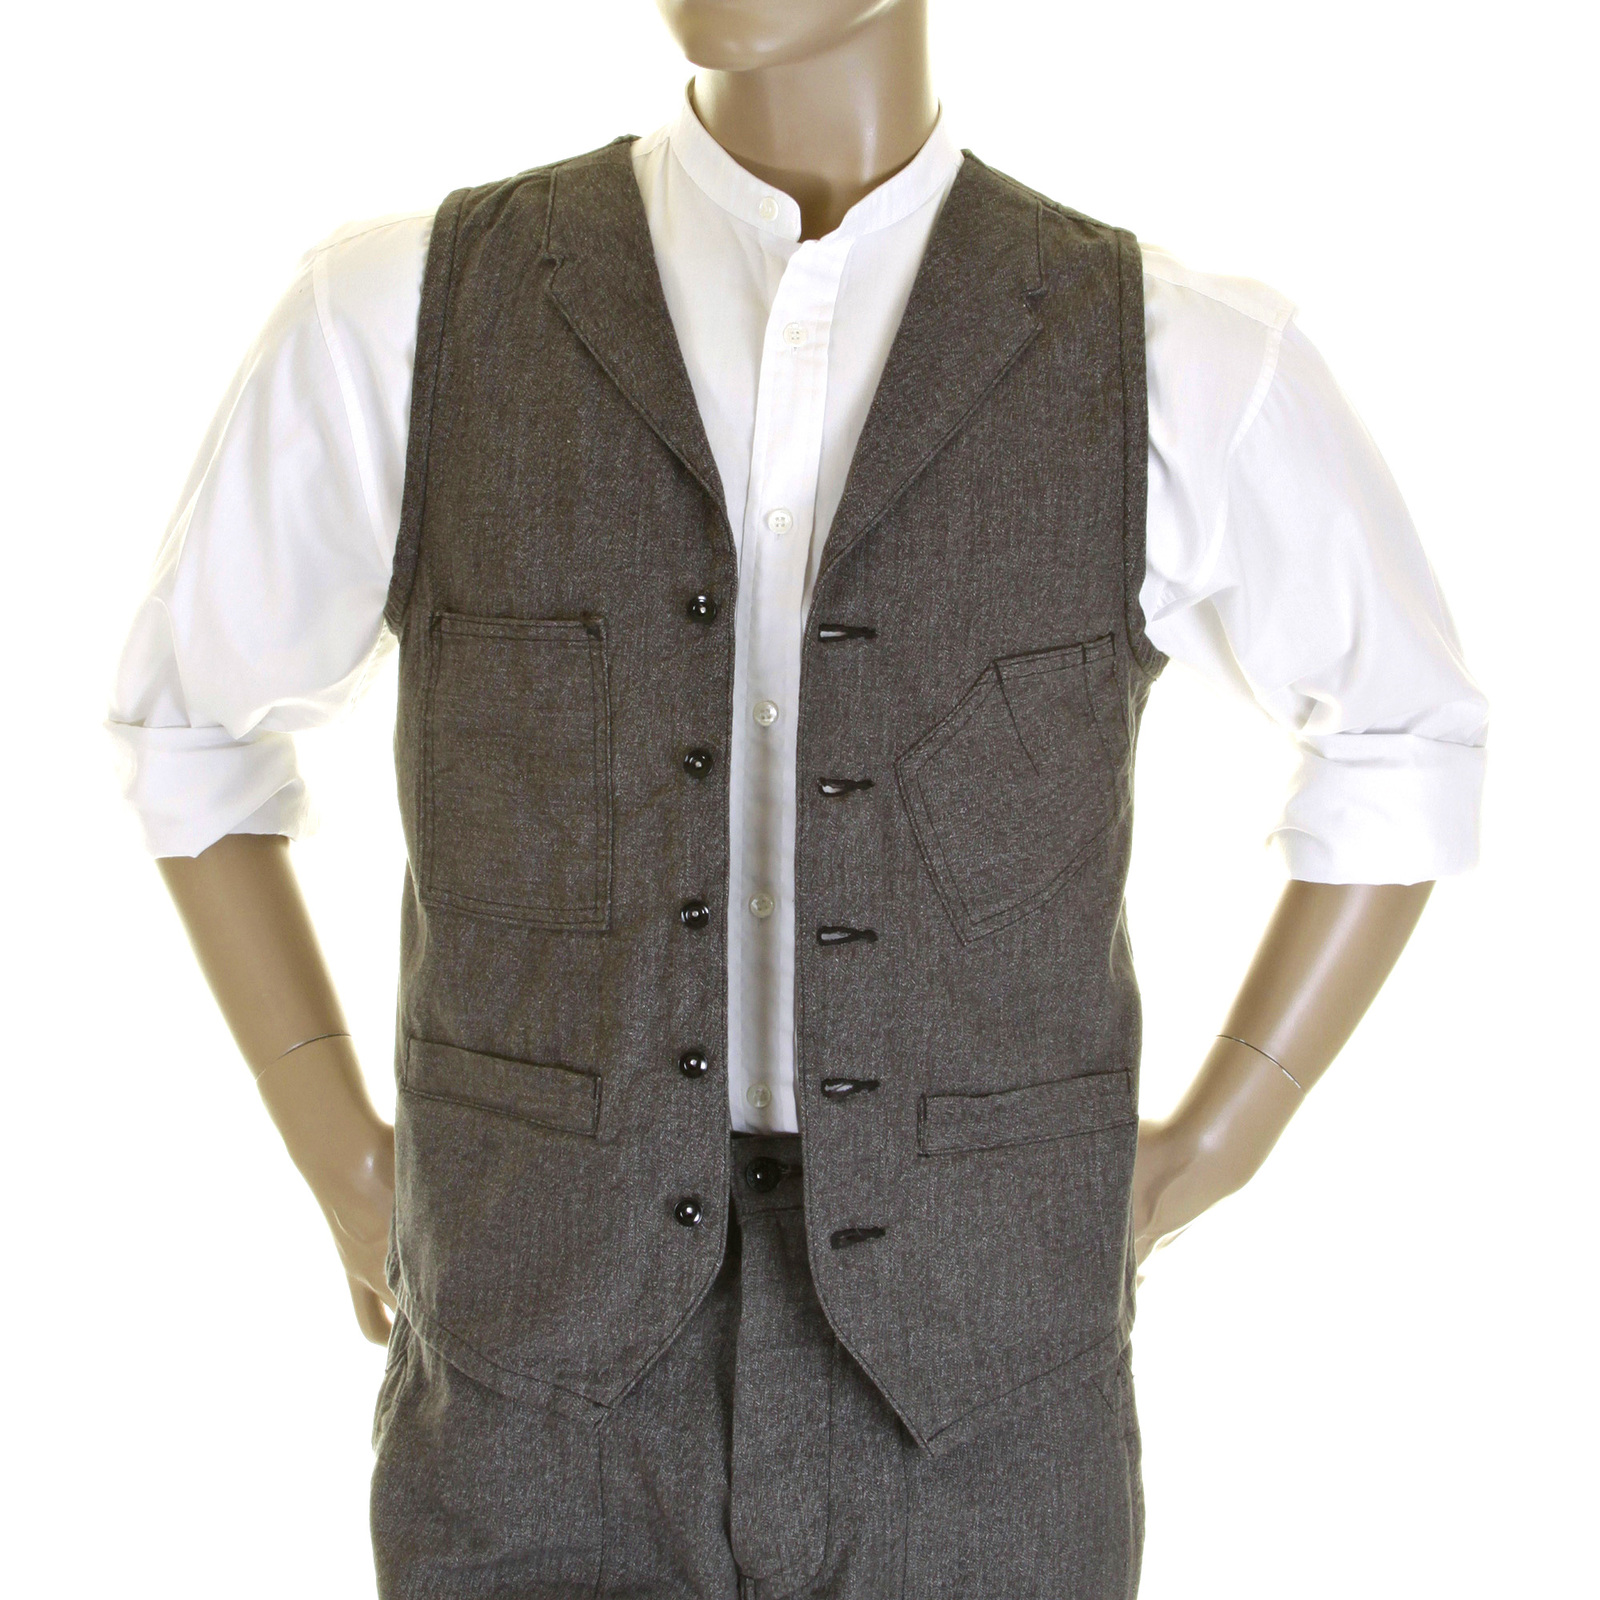 Waistcoat, Tweed, Dark, Mens Vest, Mens Waistcoat, Wedding Vest, Woodland Wedding, Folk, Alternative Wedding, Vintage, Traditional.